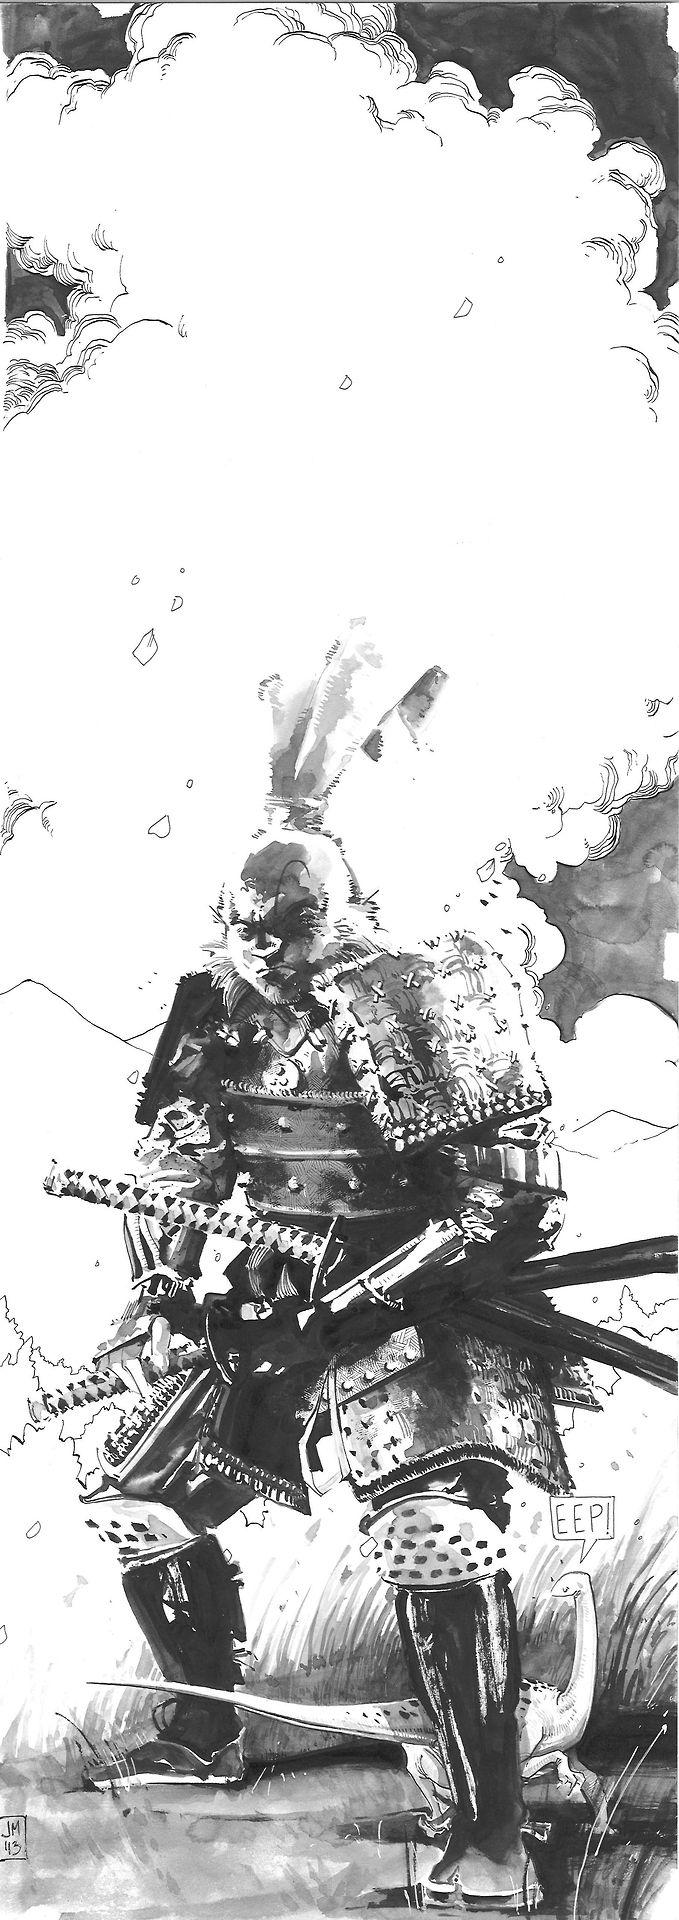 Usagi Yojimbo by jonomarks on deviantART